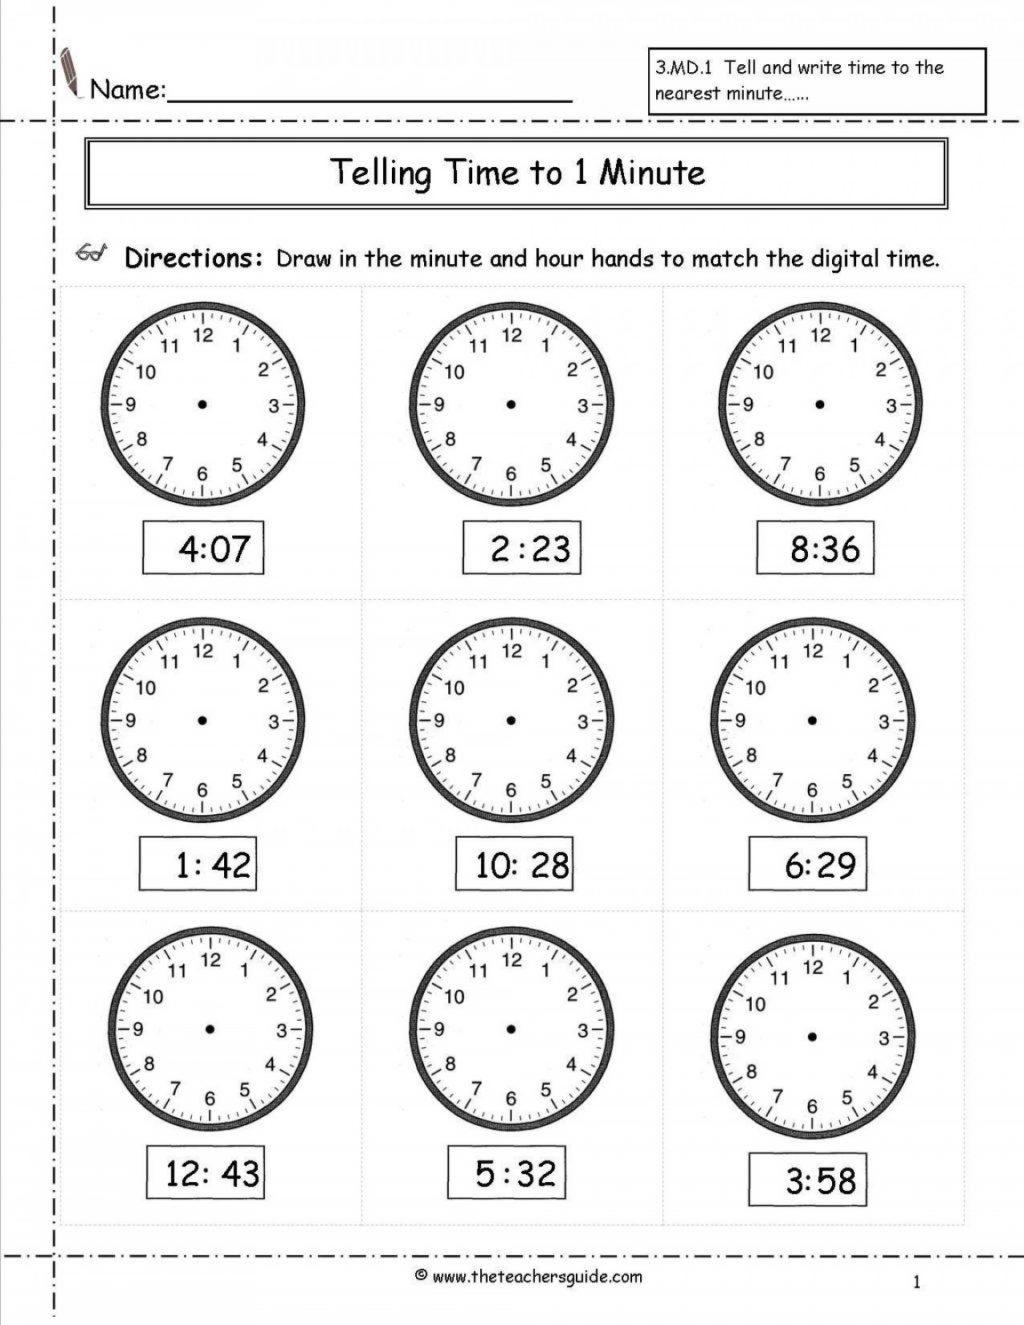 Reading Worskheets: Letter Tracing For Preschoolers Free for Letter Ii Worksheets For Kindergarten